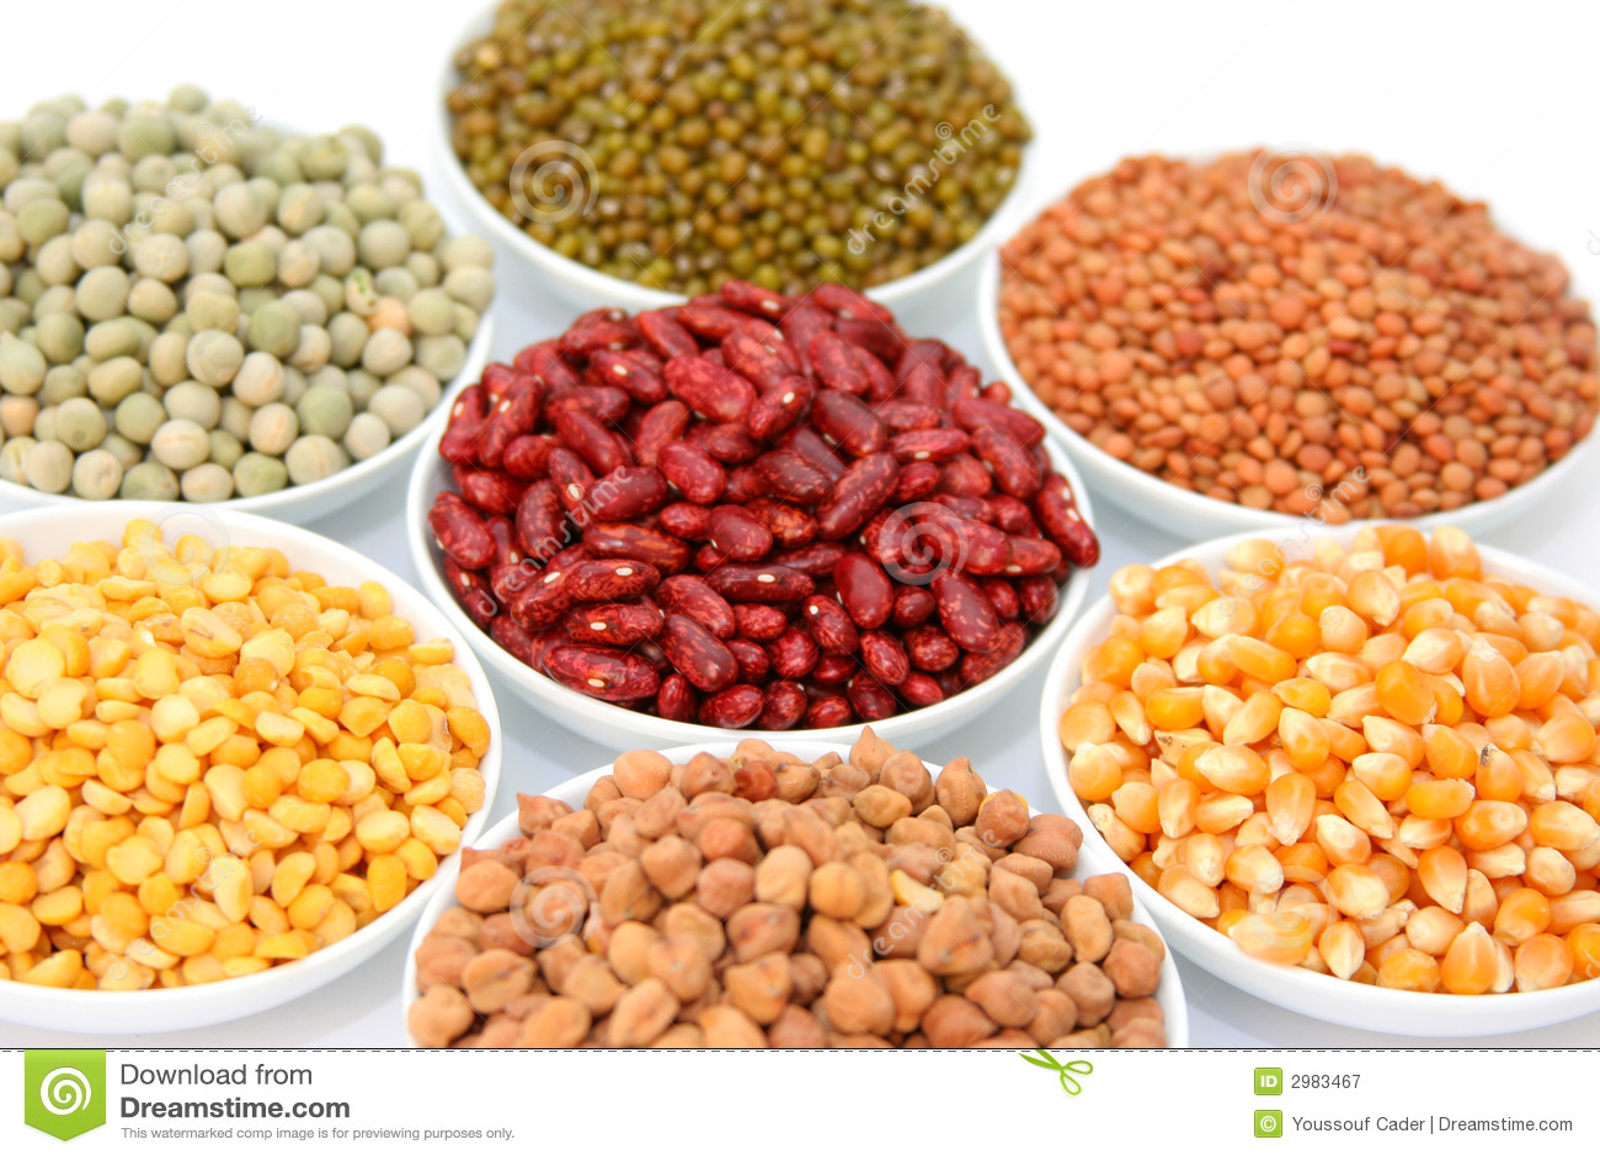 Grains stock image. Image of agricultural, arrangement ...